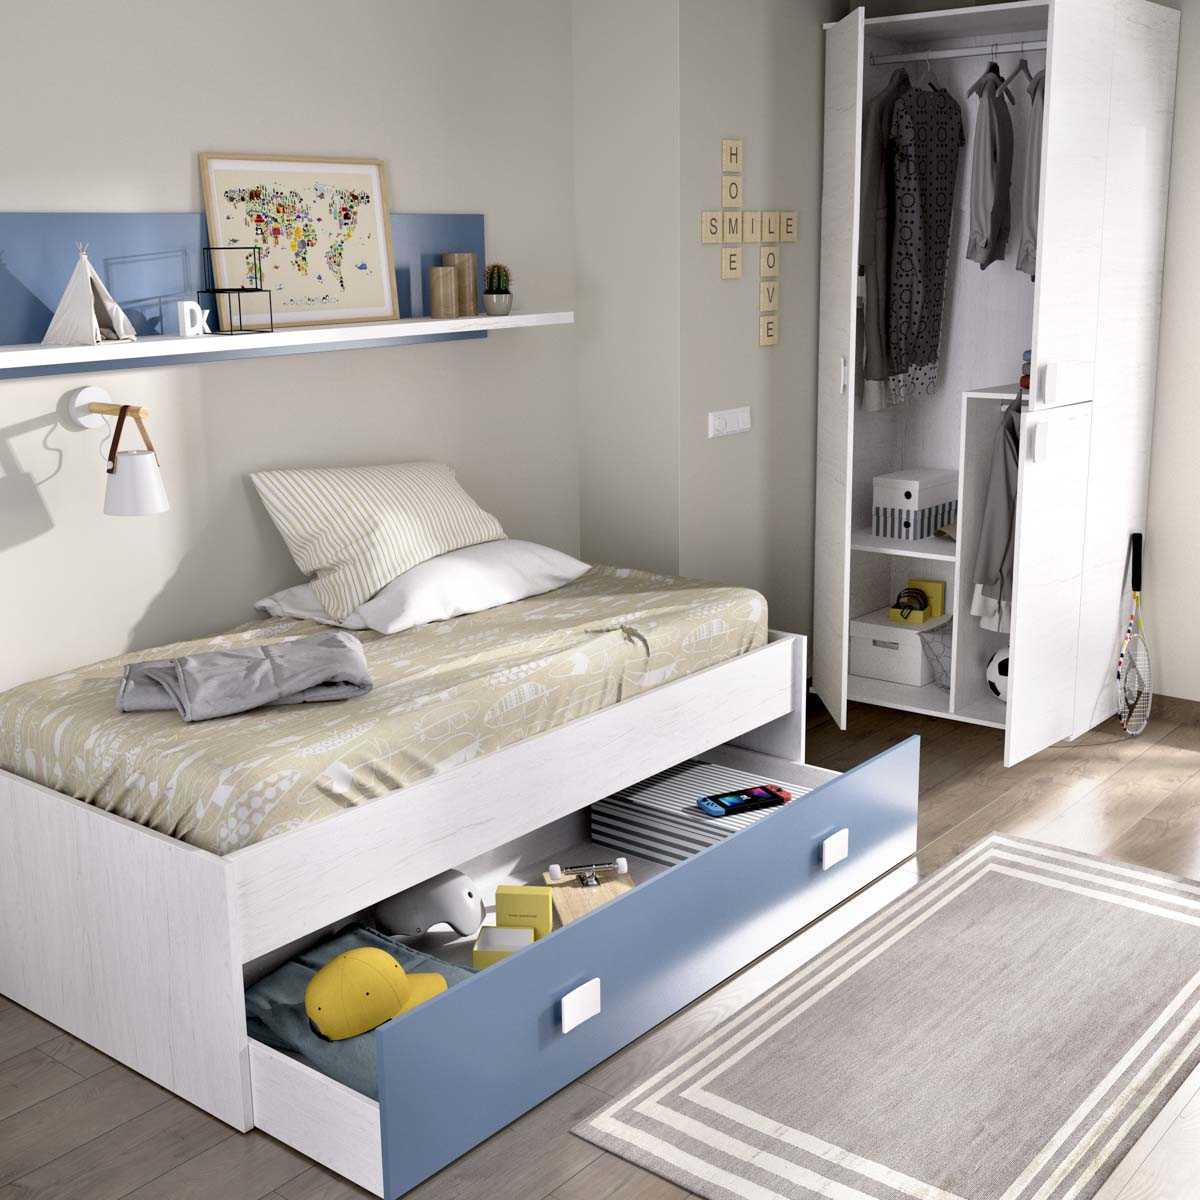 cama nido 1 azul cajon estanteria